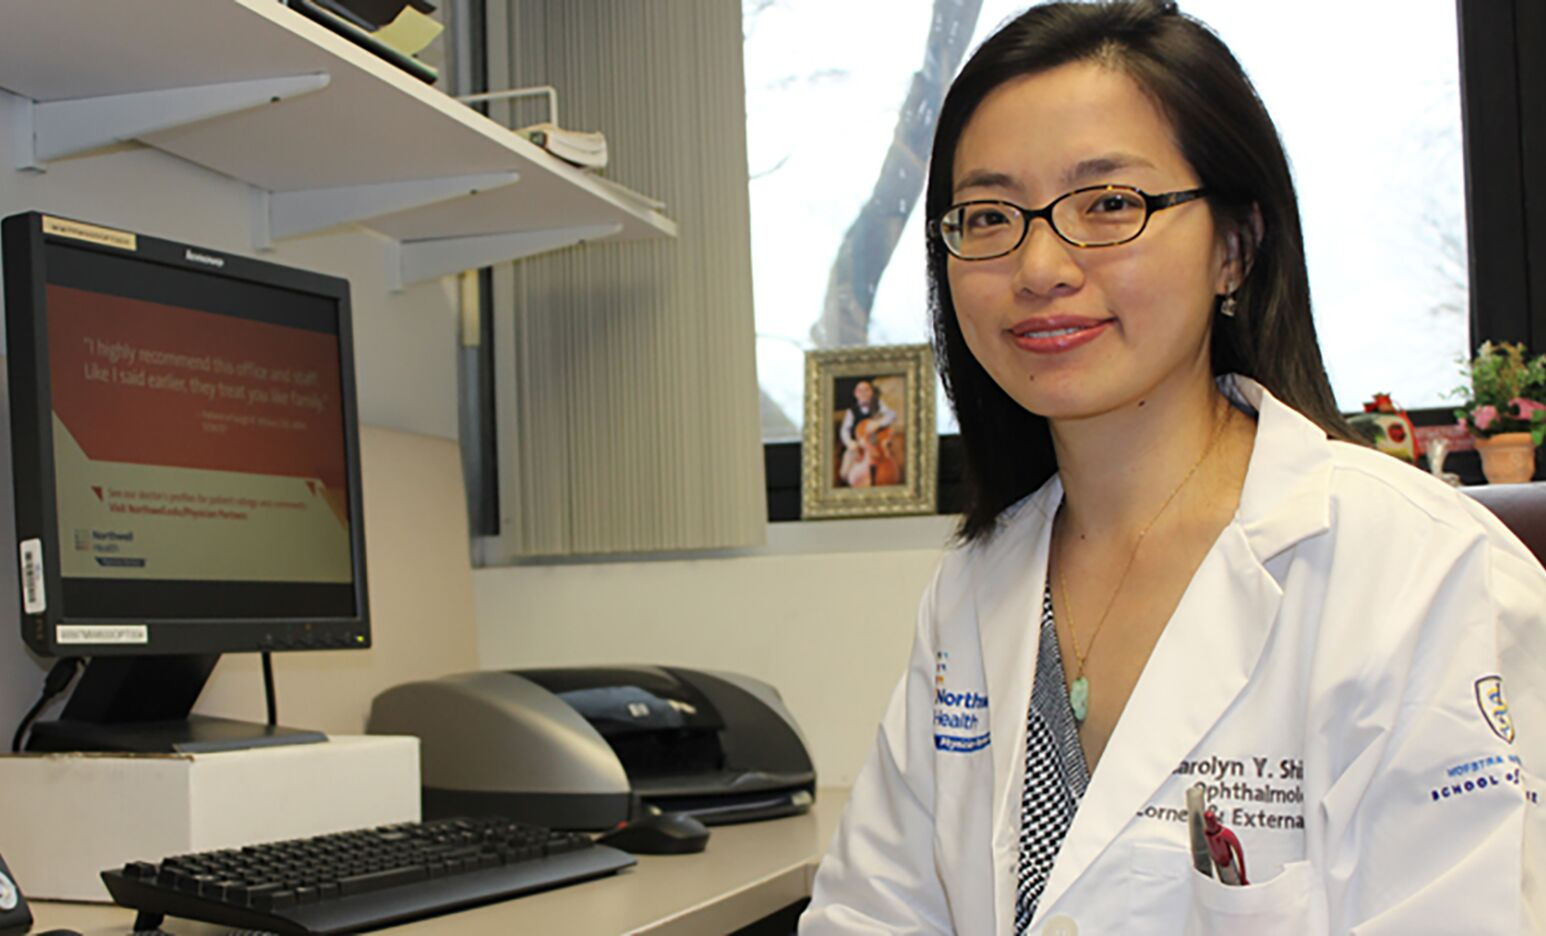 Carolyn Shih, MD, has performed countless cornea transplants, including DMEK on Robert Sohovich